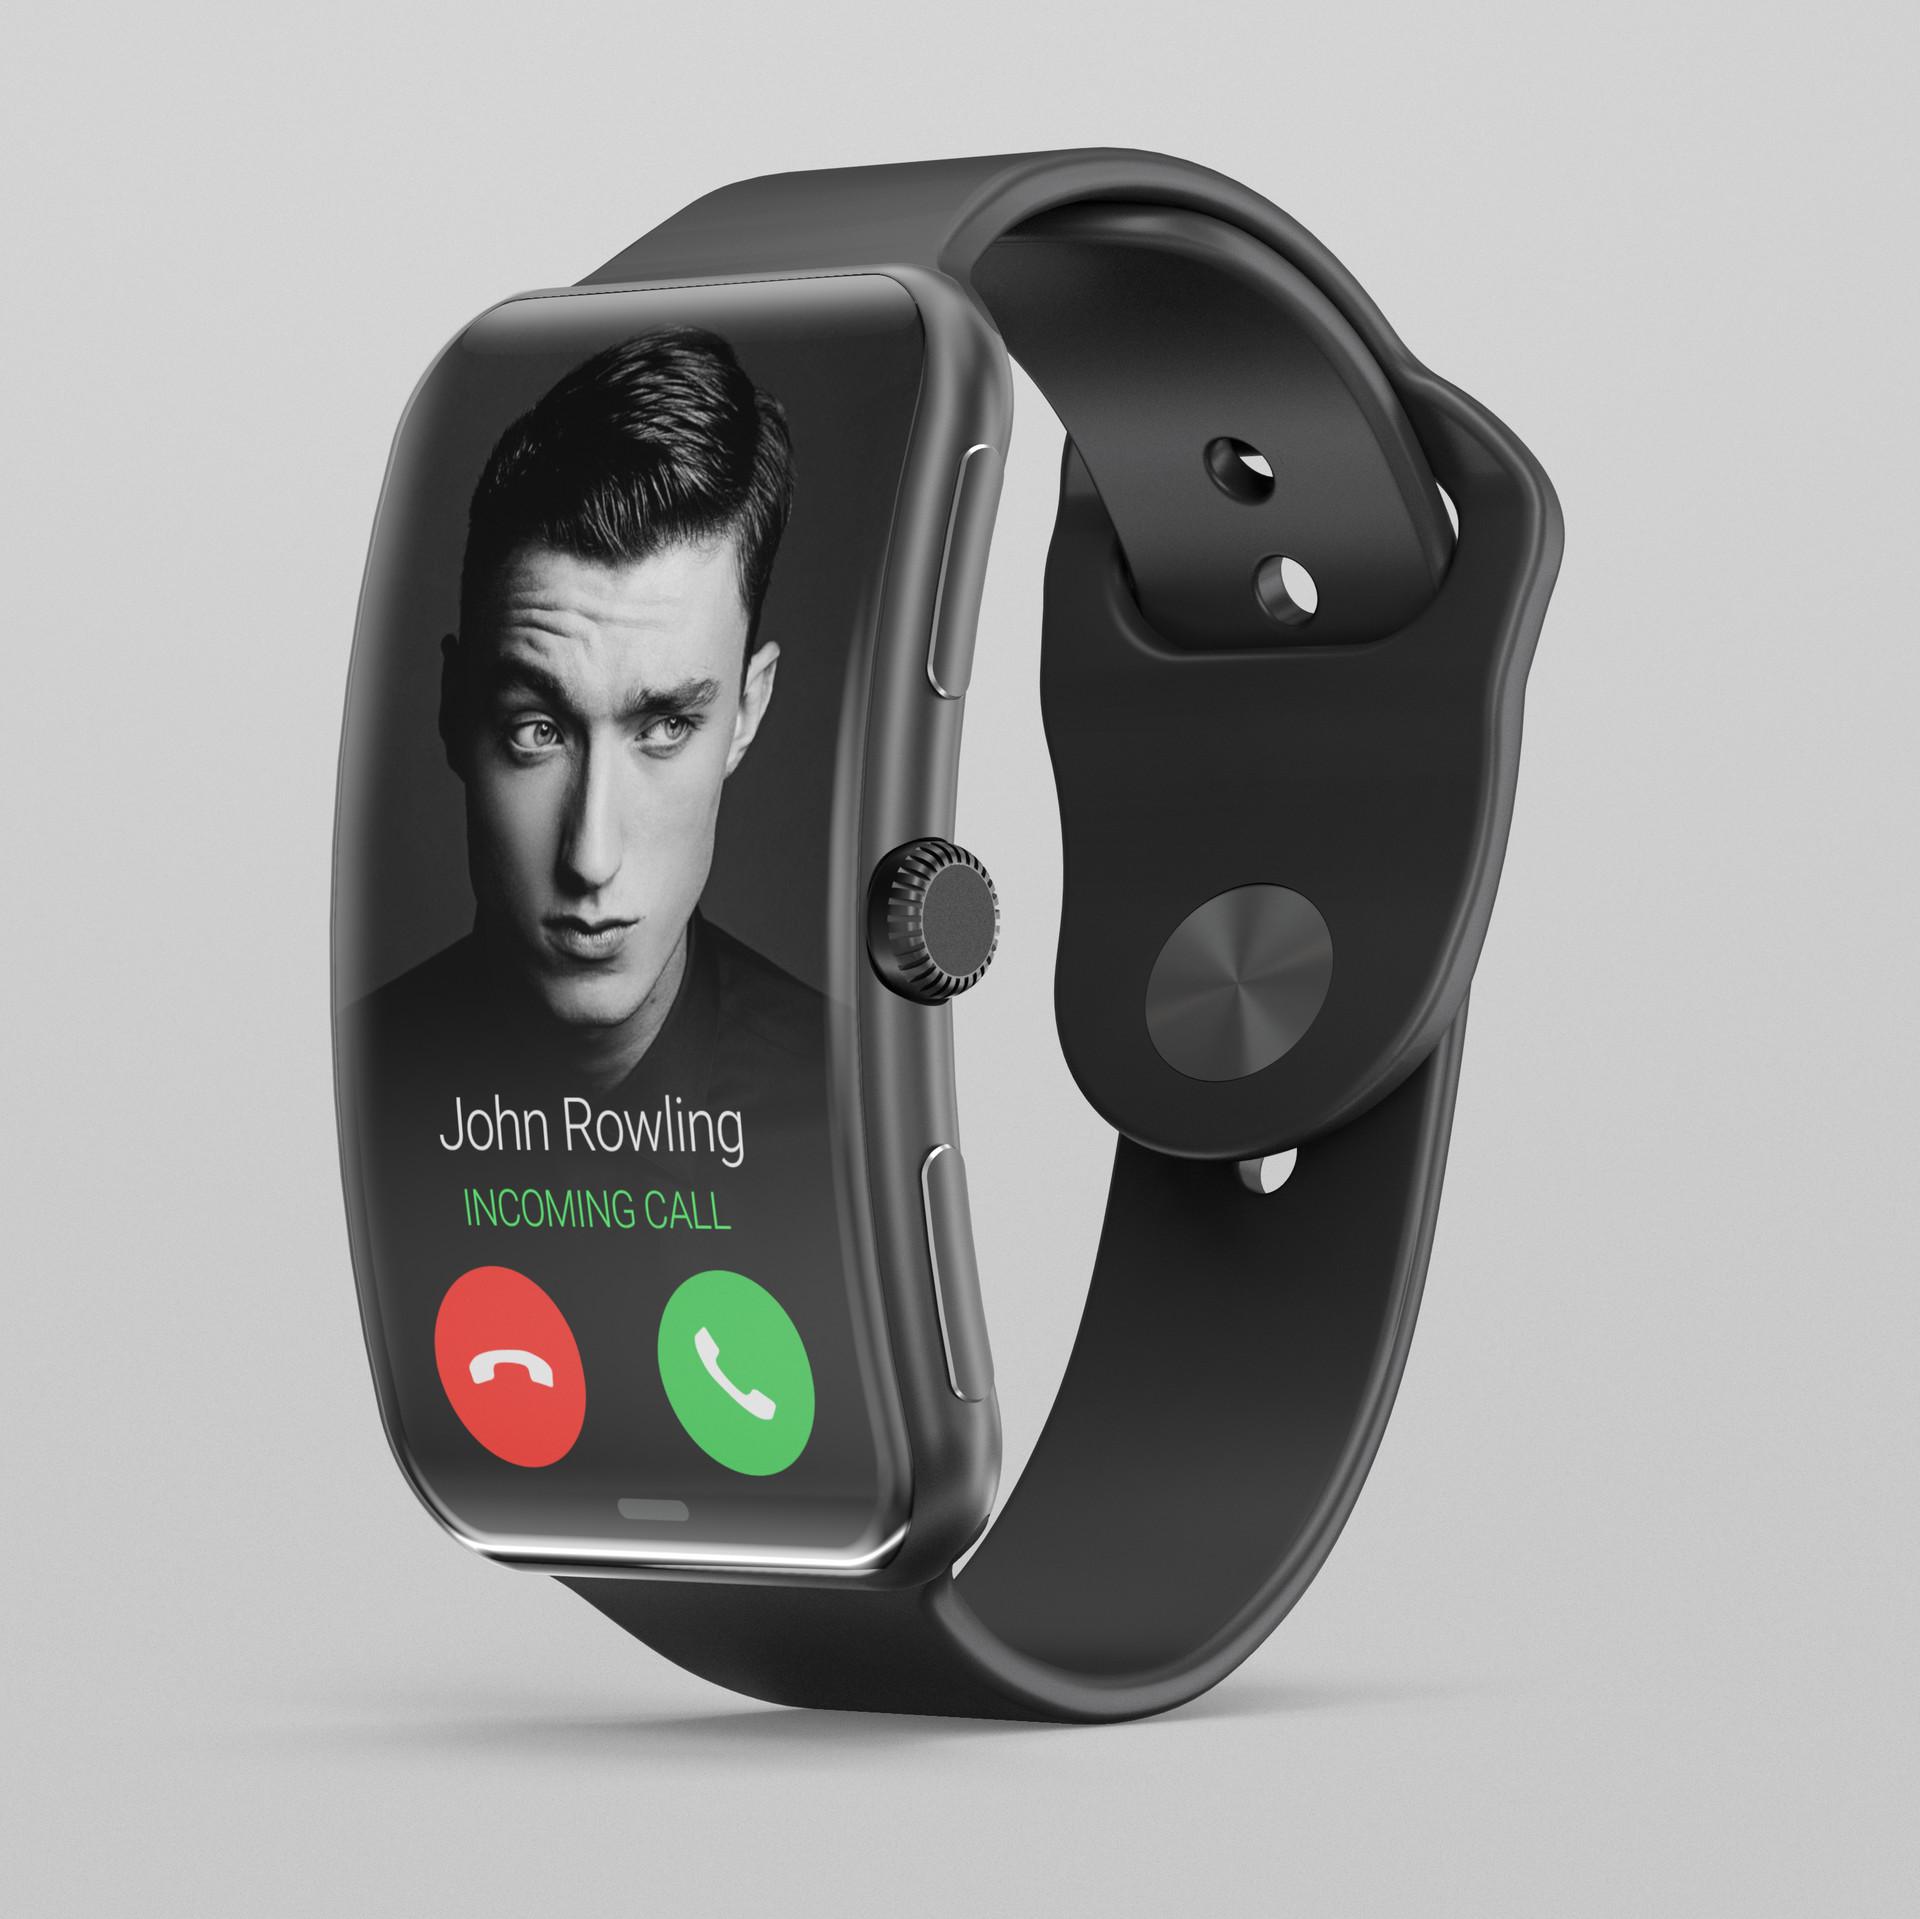 Roman tikhonov apple watch 5 render